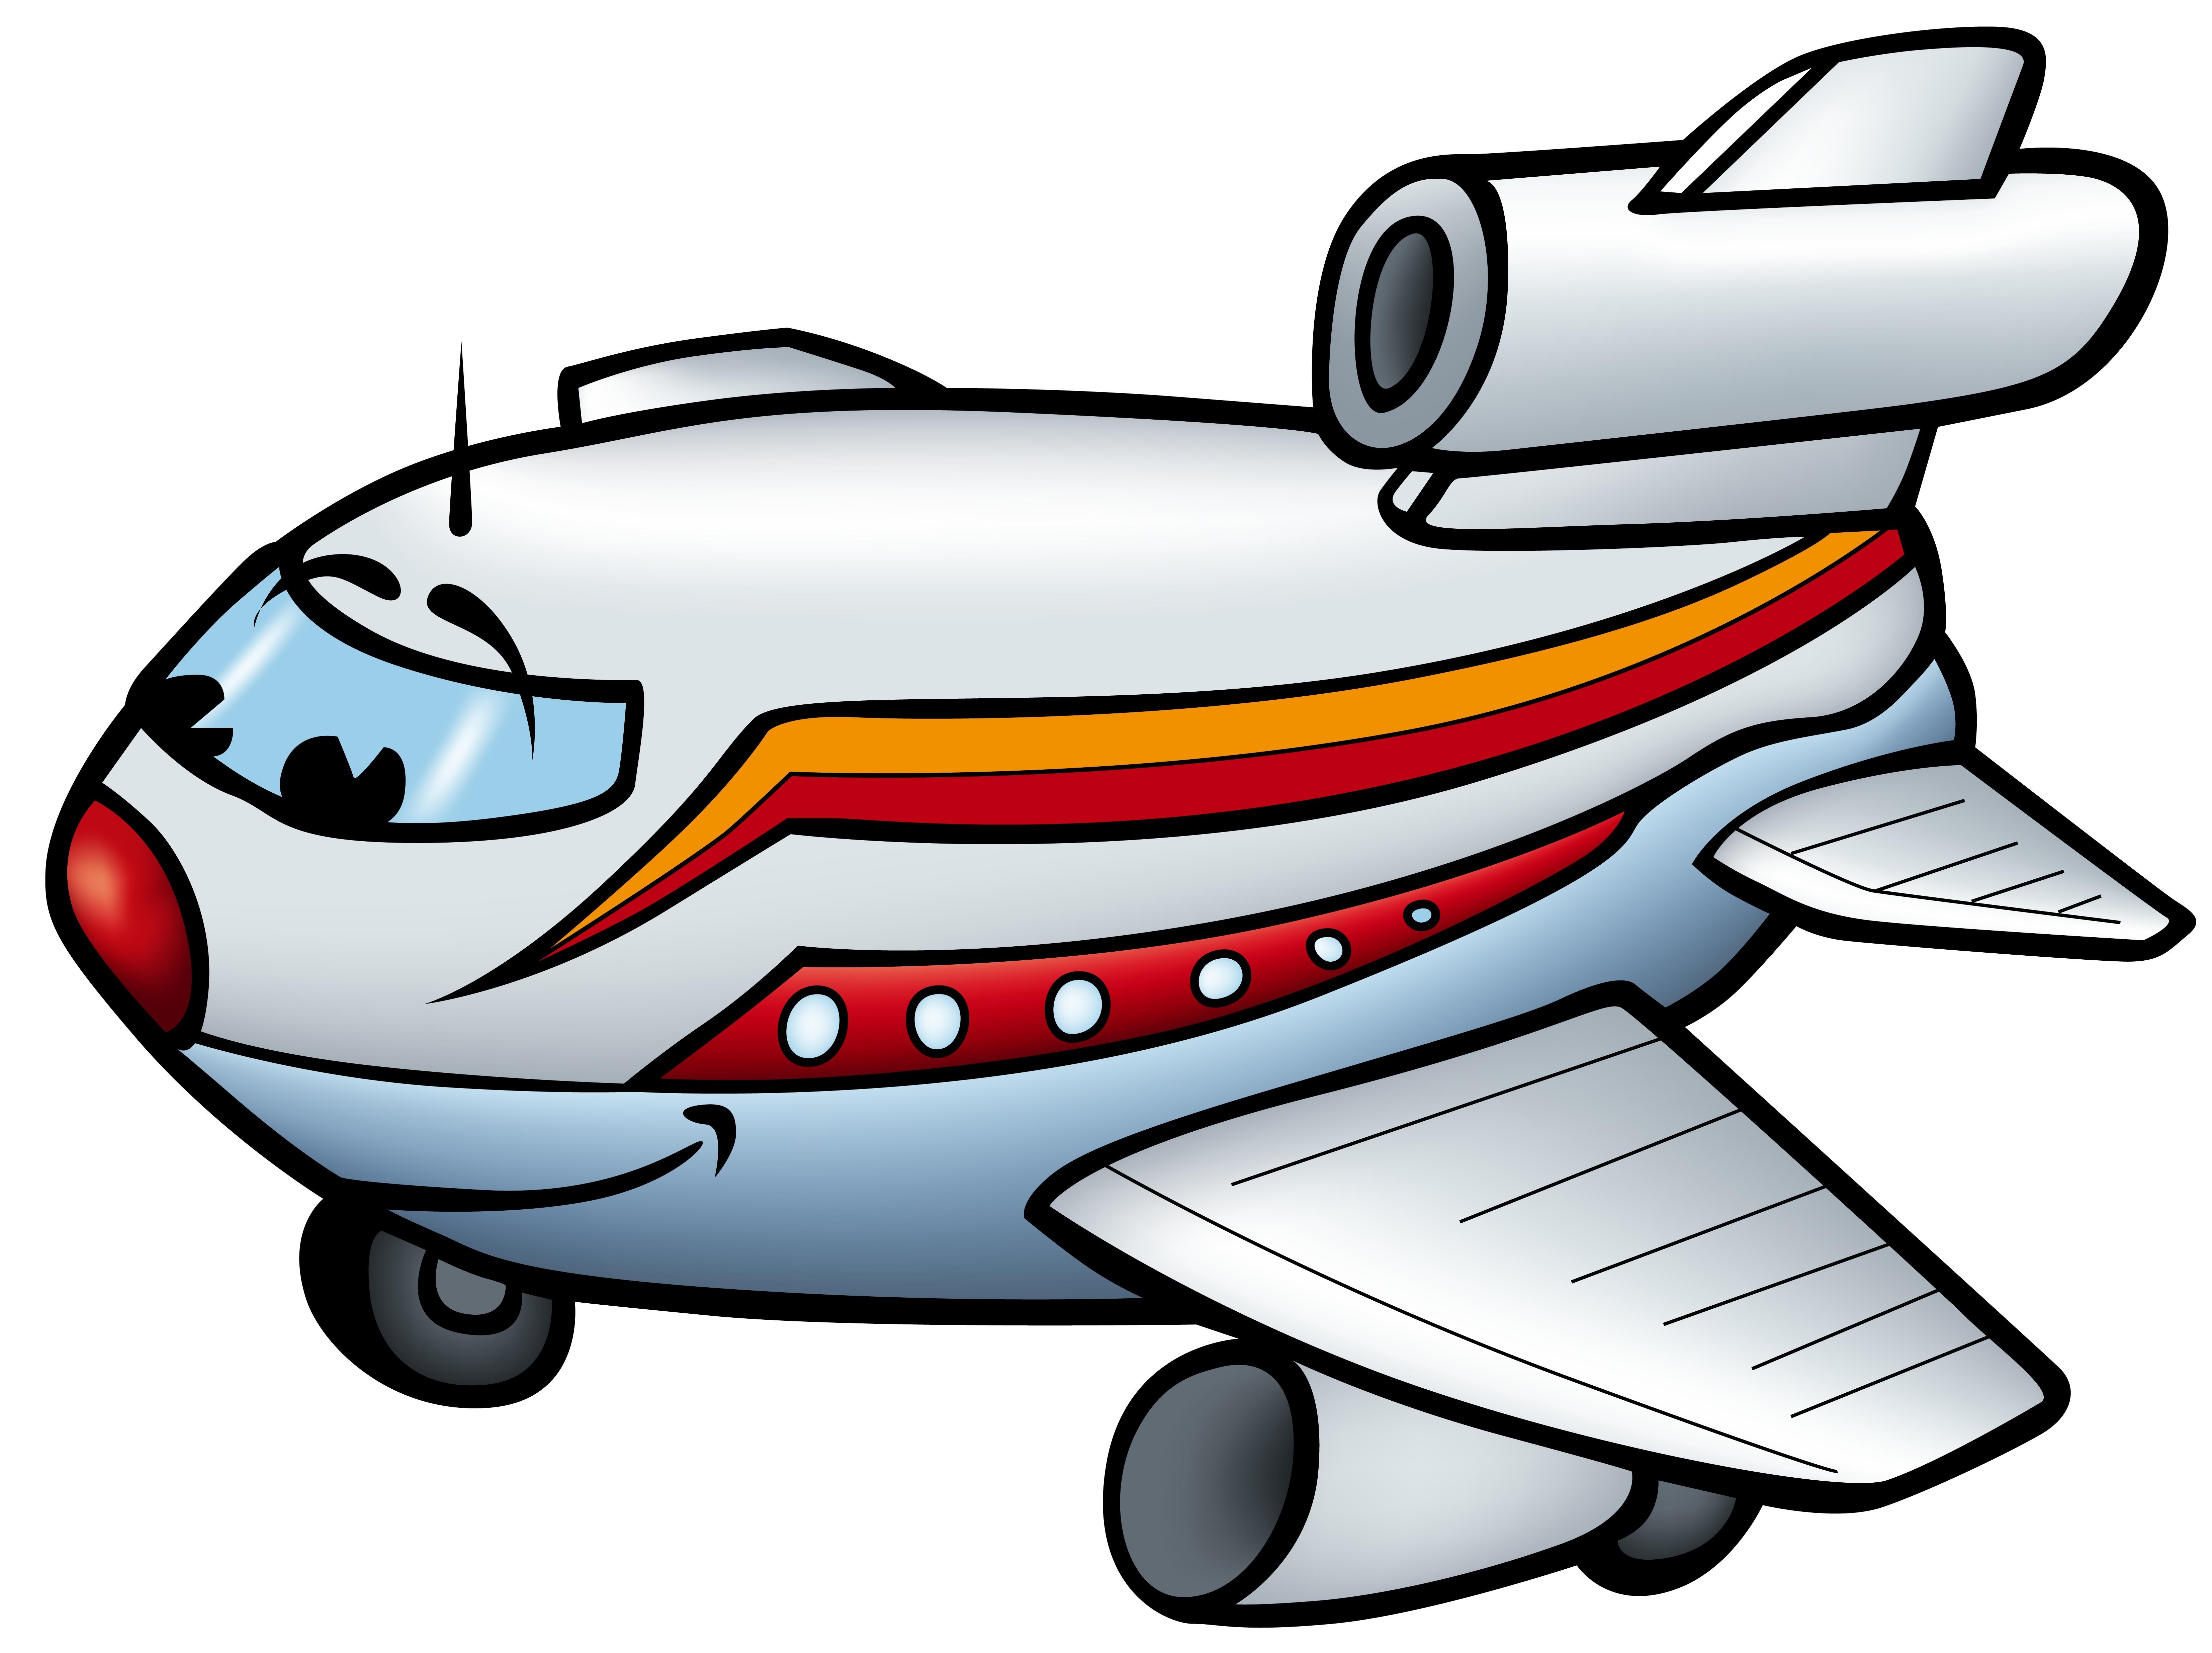 Free Aeroplane Cartoon, Download Free Clip Art, Free Clip Art on.